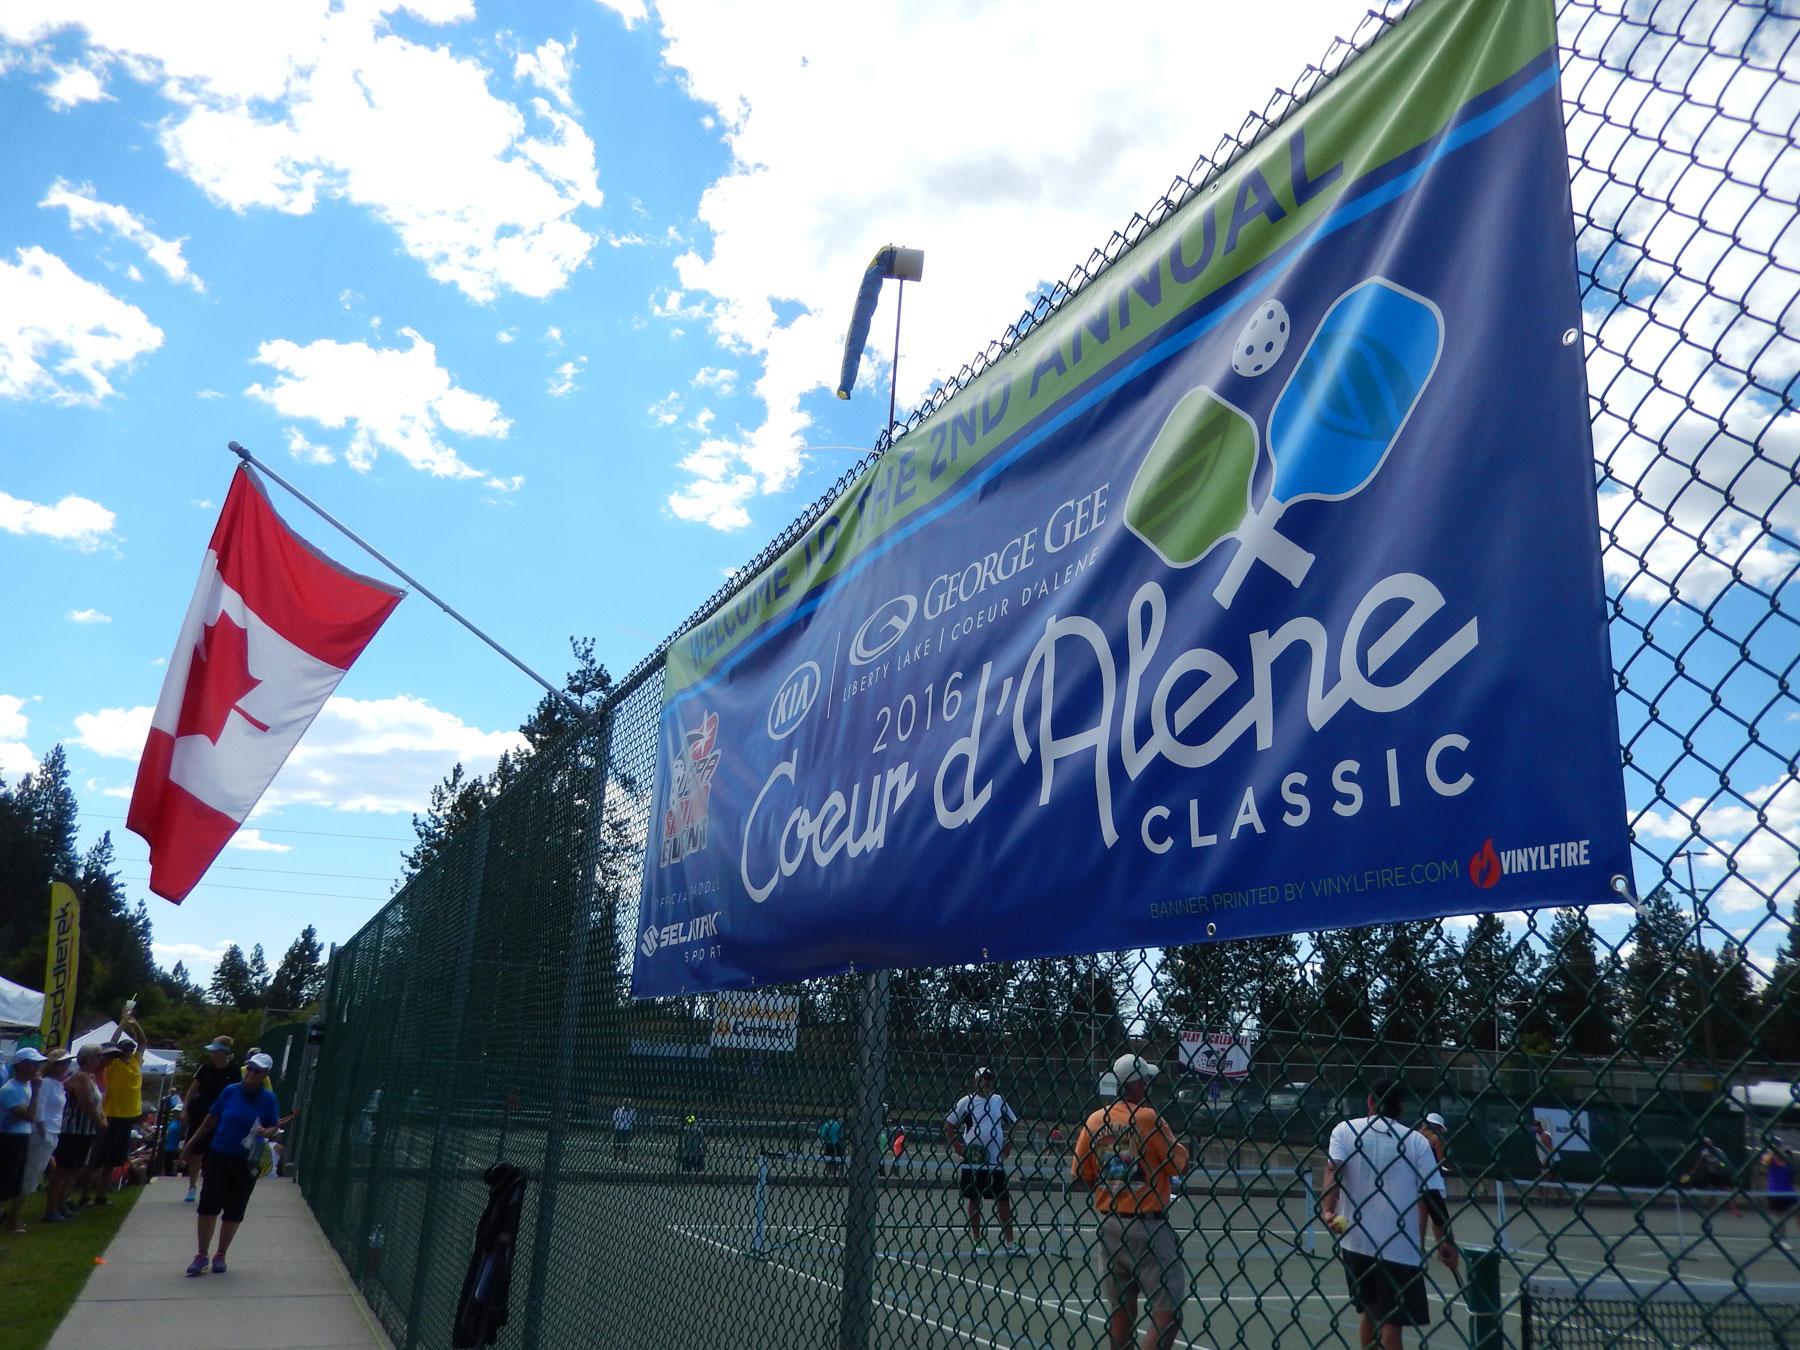 2016 Coeur d'Alene Classic Pickleball Tournament